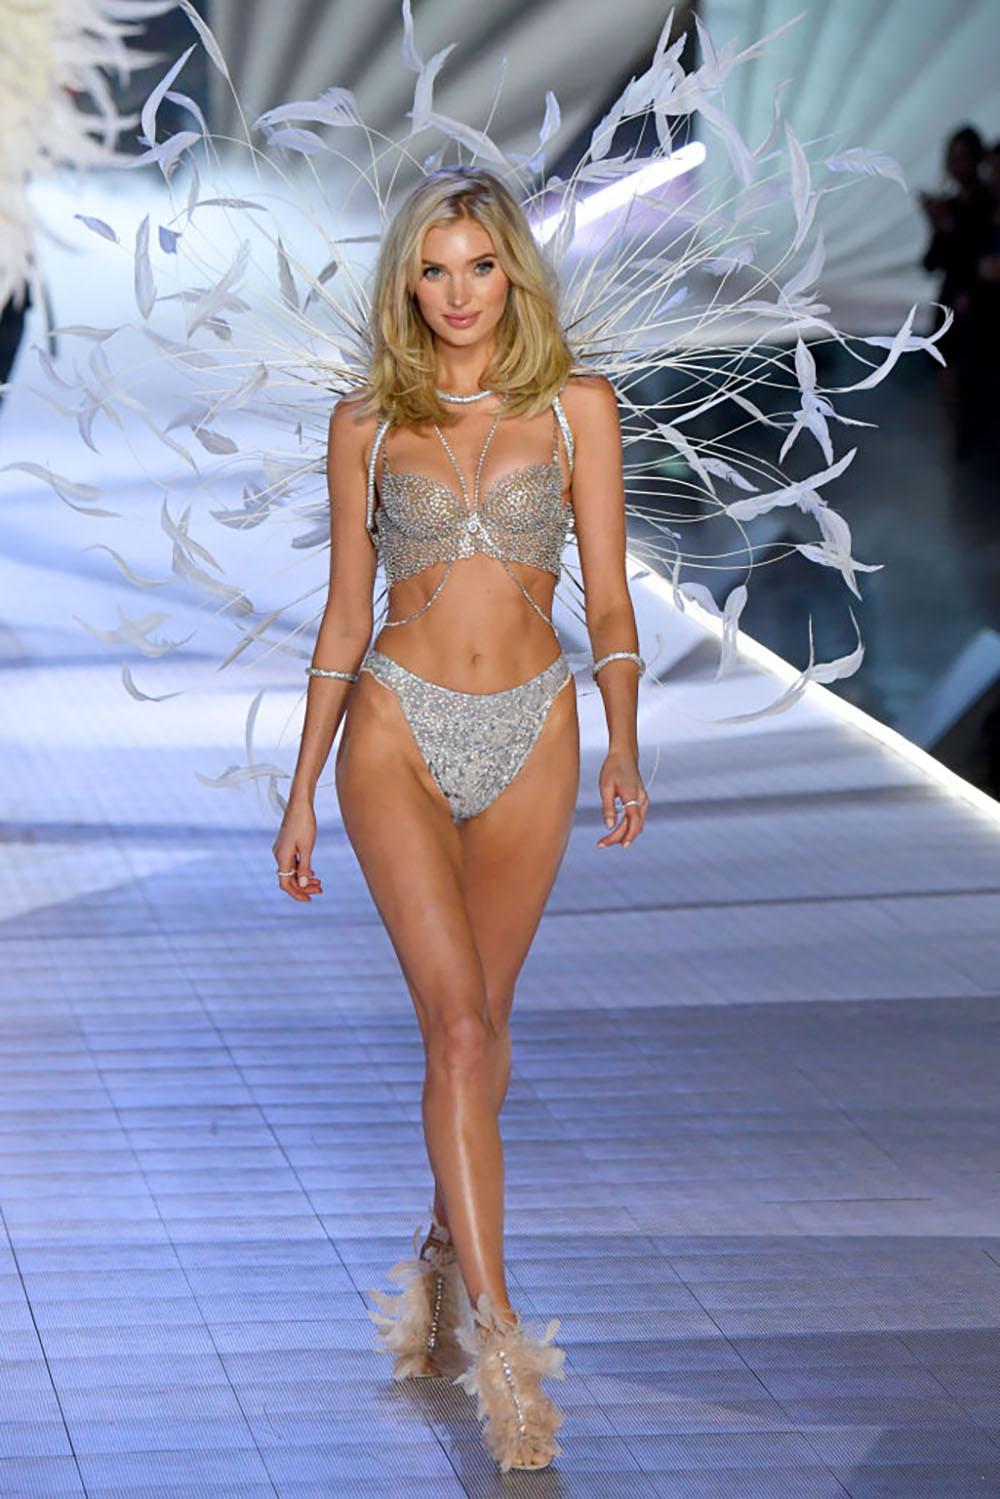 How-these-Victorias-Secret-models-look-THAT-amazing-Elsa-Hosk